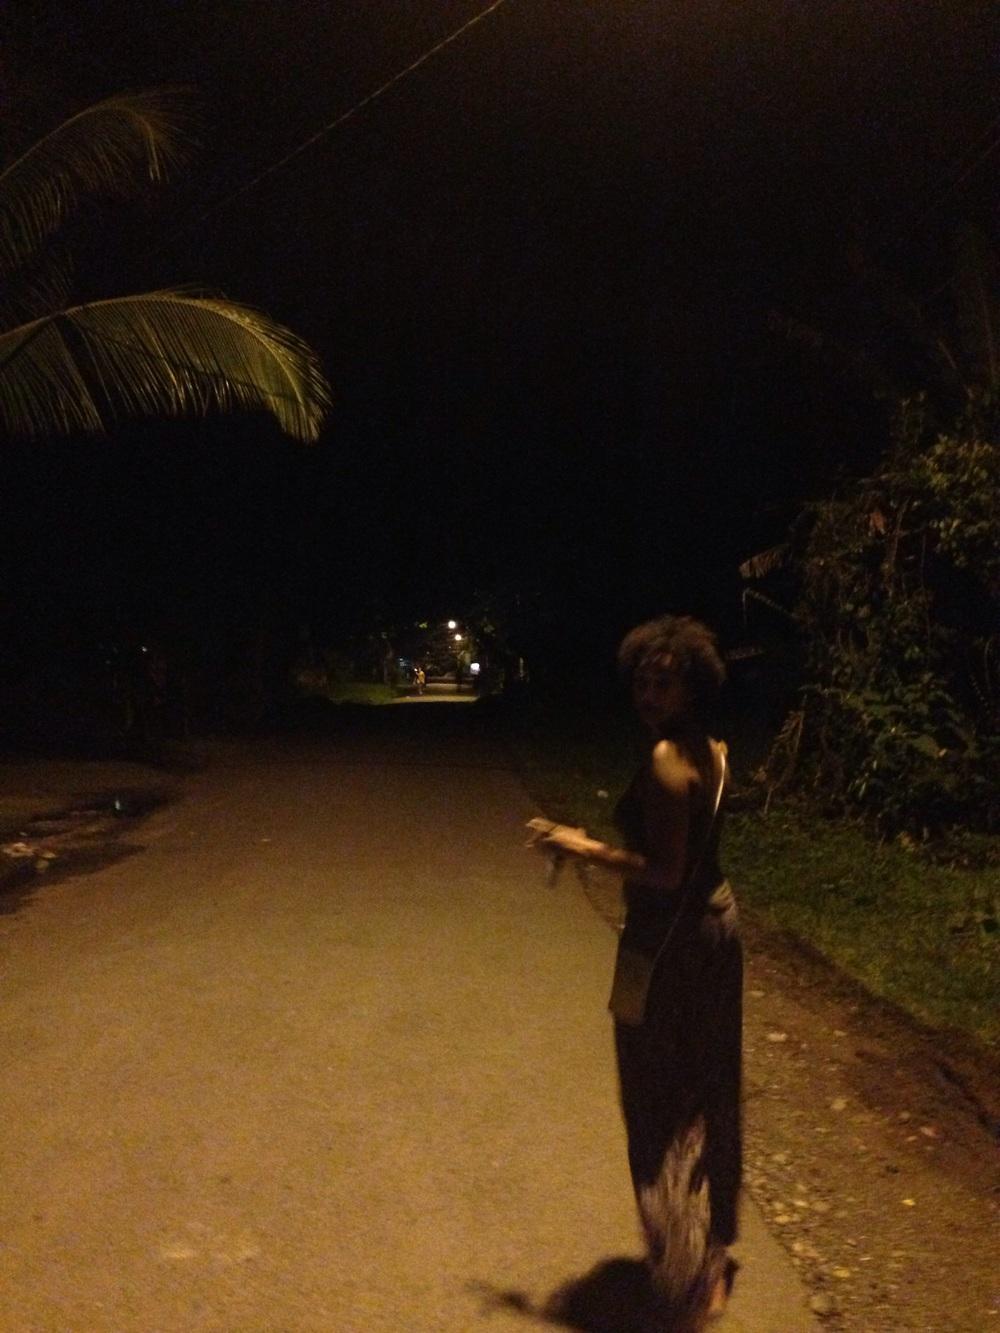 Night walk in Puerto Viejo, Costa Rica